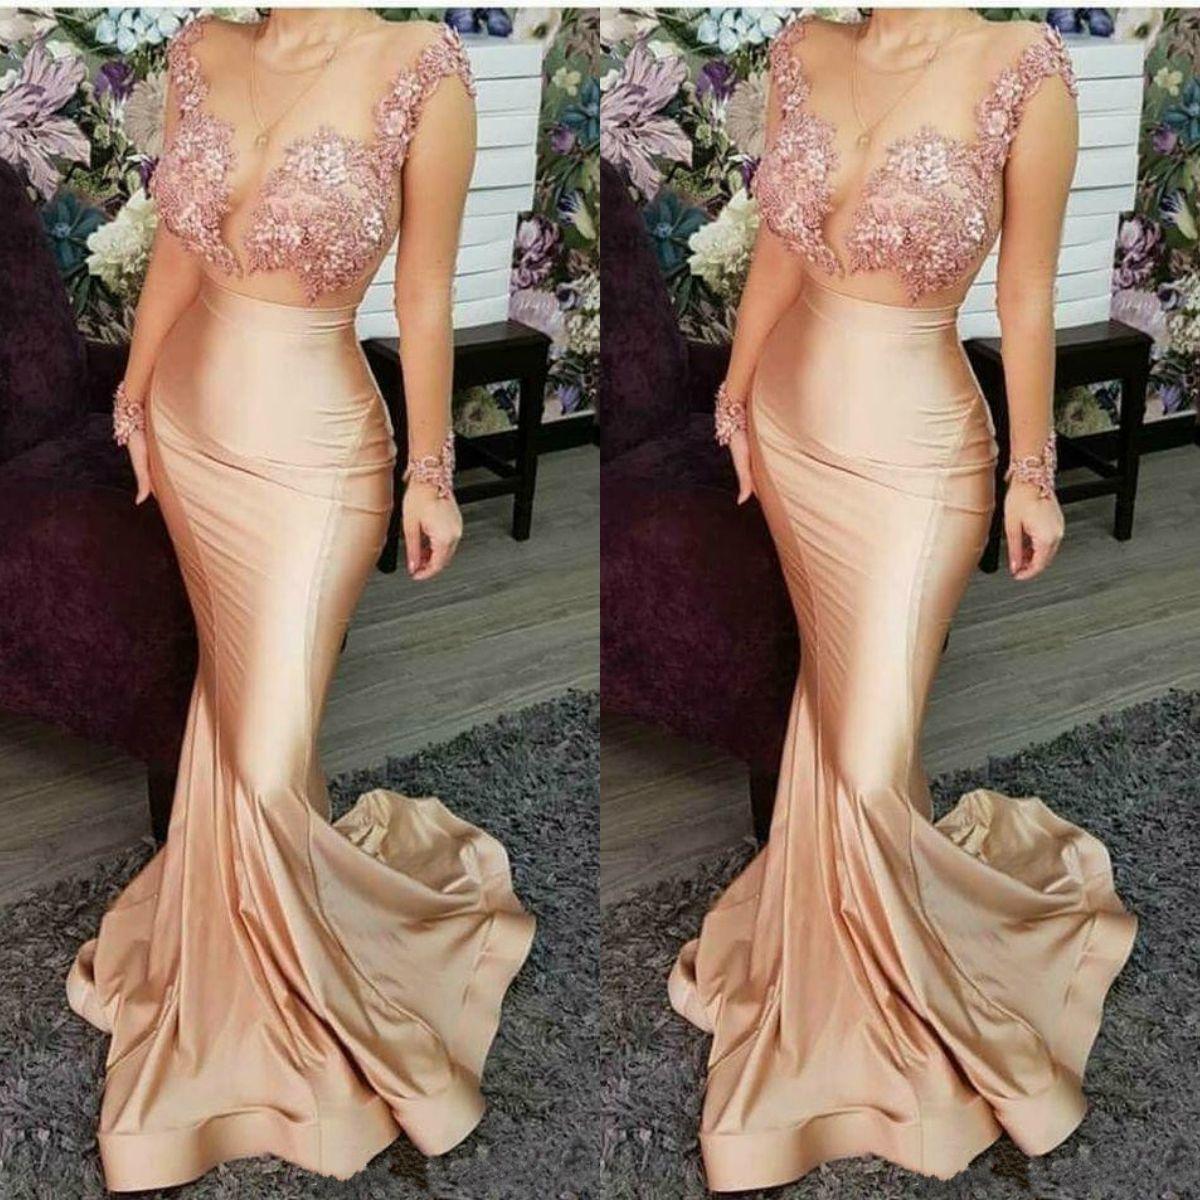 Champagne Sexy Mermaid 2019 Abendkleider Sheer Neck Long Sleeves Perlen Spitze Prom Dresses Günstige Formale Party Brautjungfer Pageant Kleider